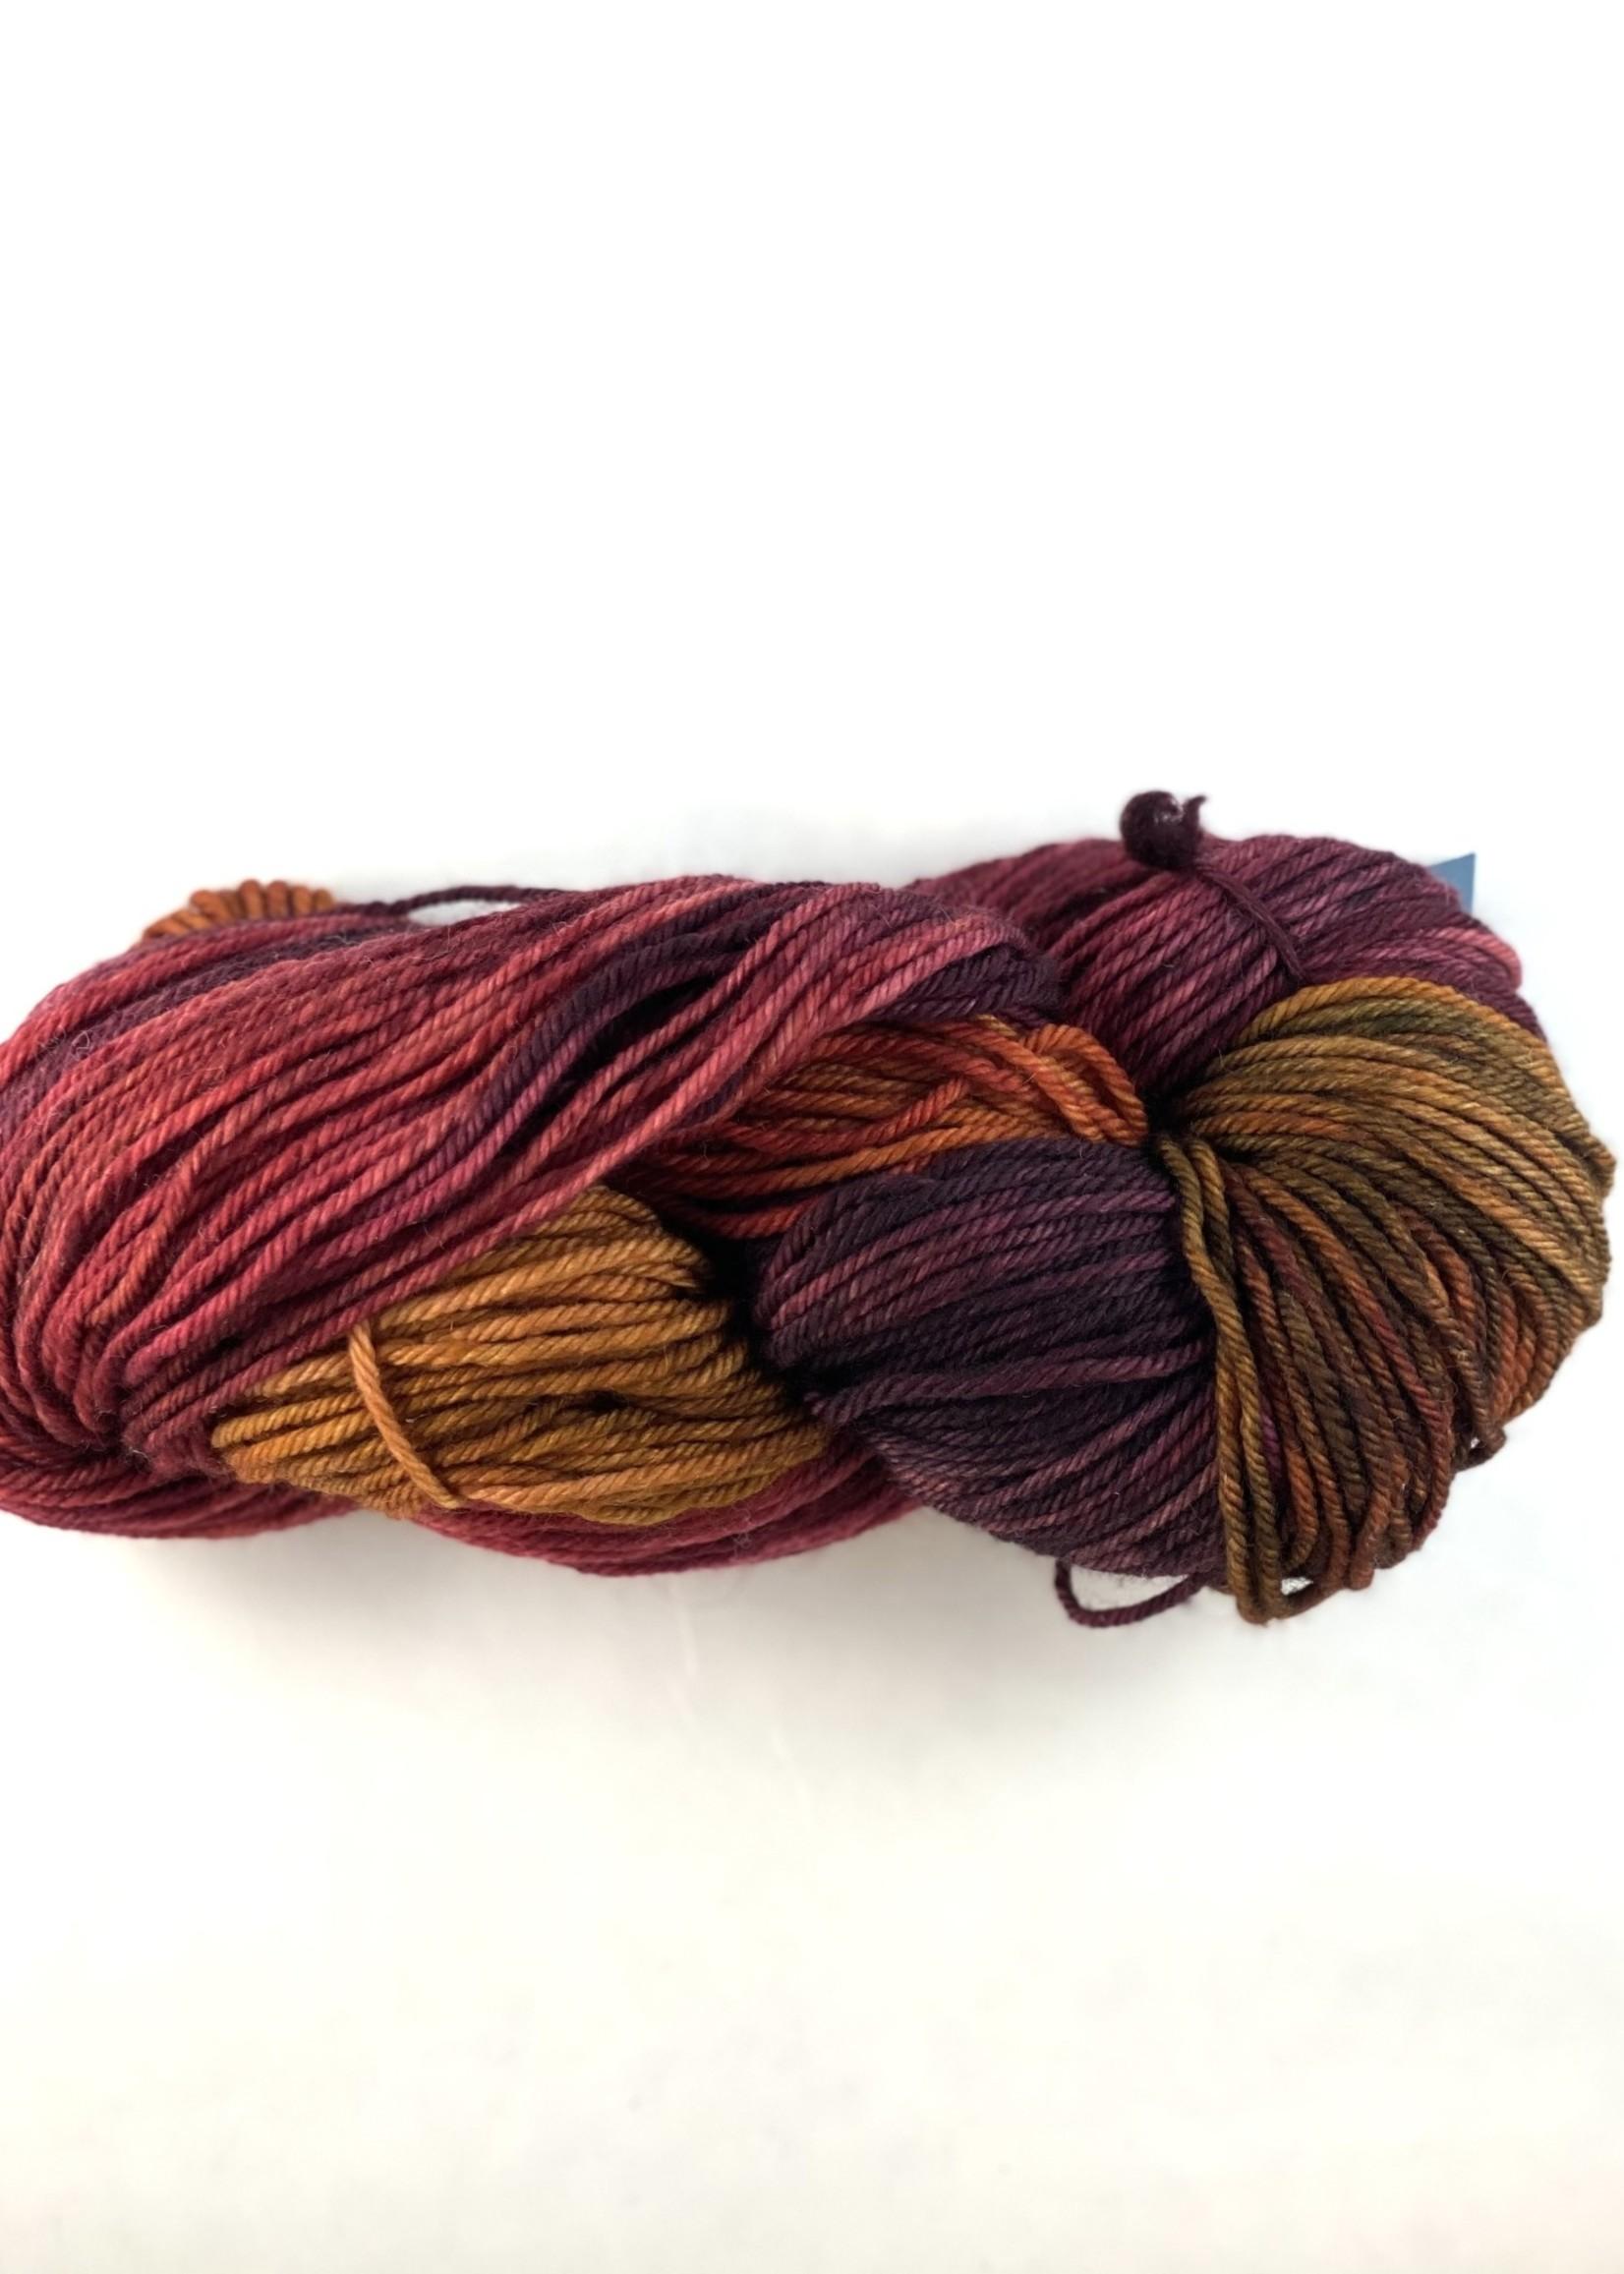 Fleece Artist Yarn Fleece Artist Chinook Yarn - Cranberry Chutney